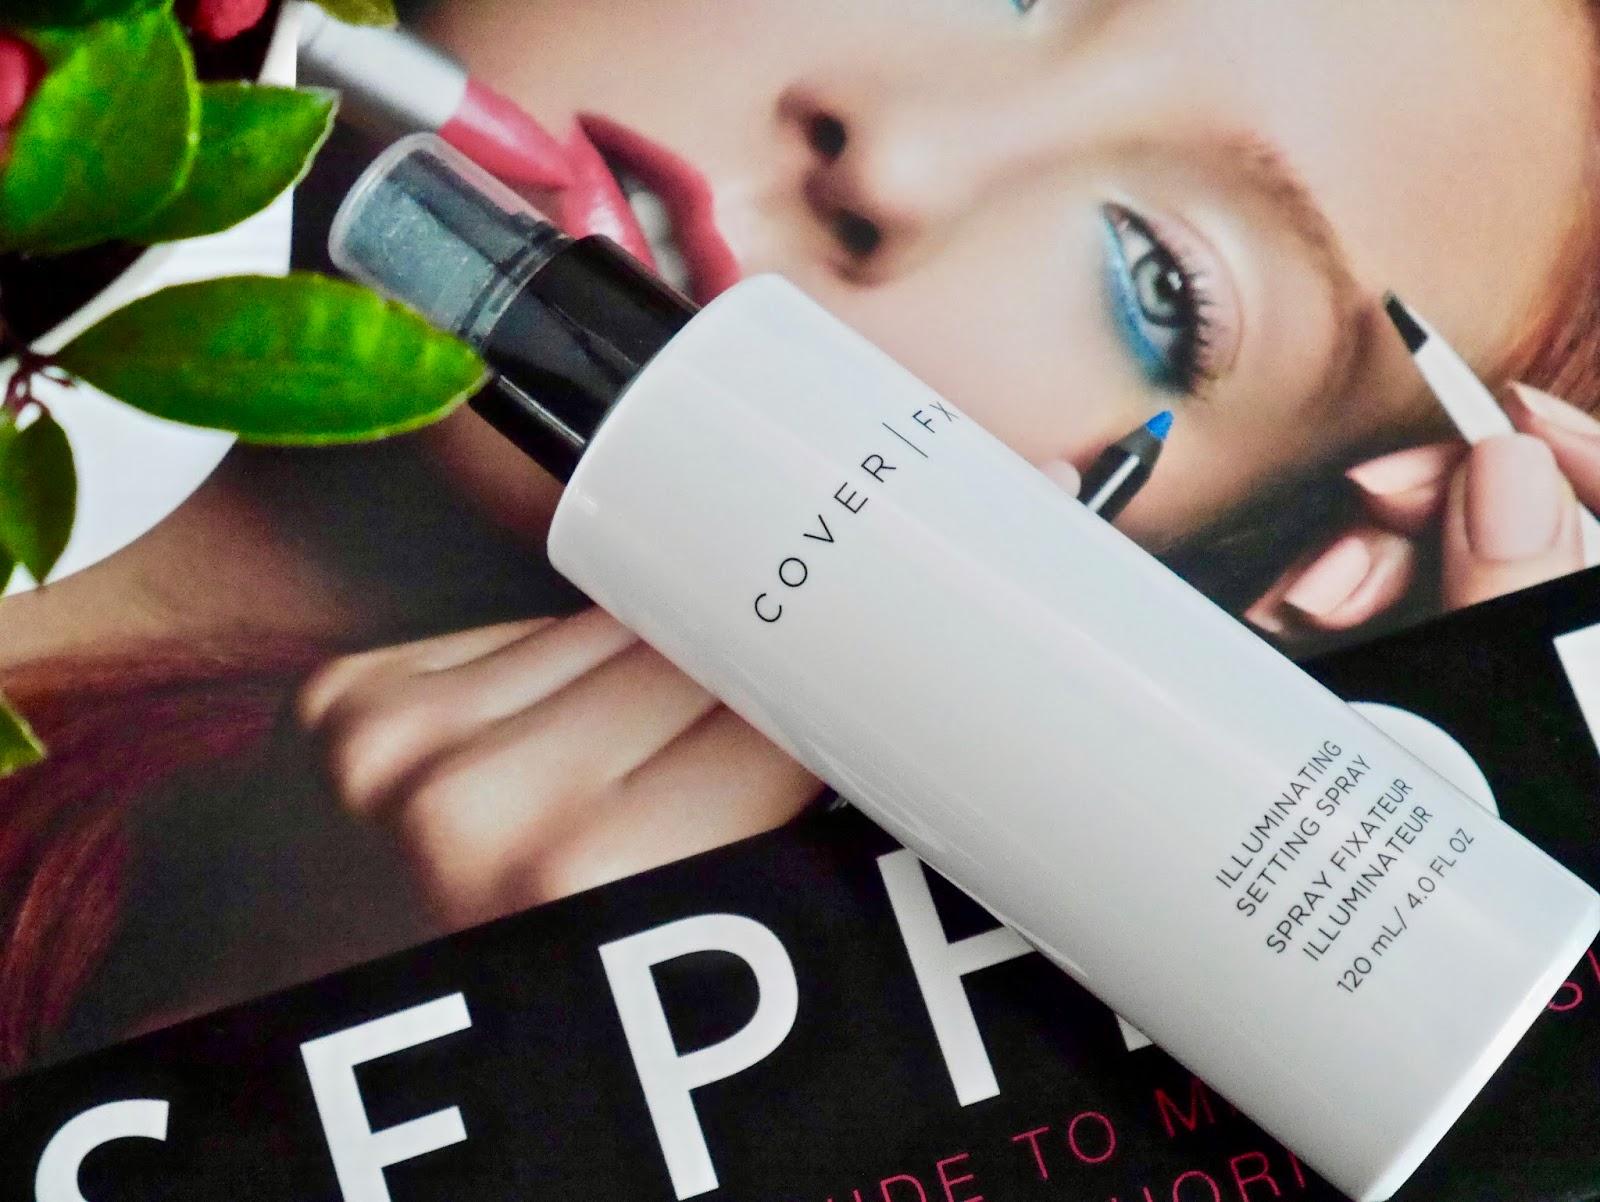 sephora, makeup, setting spray, beauty